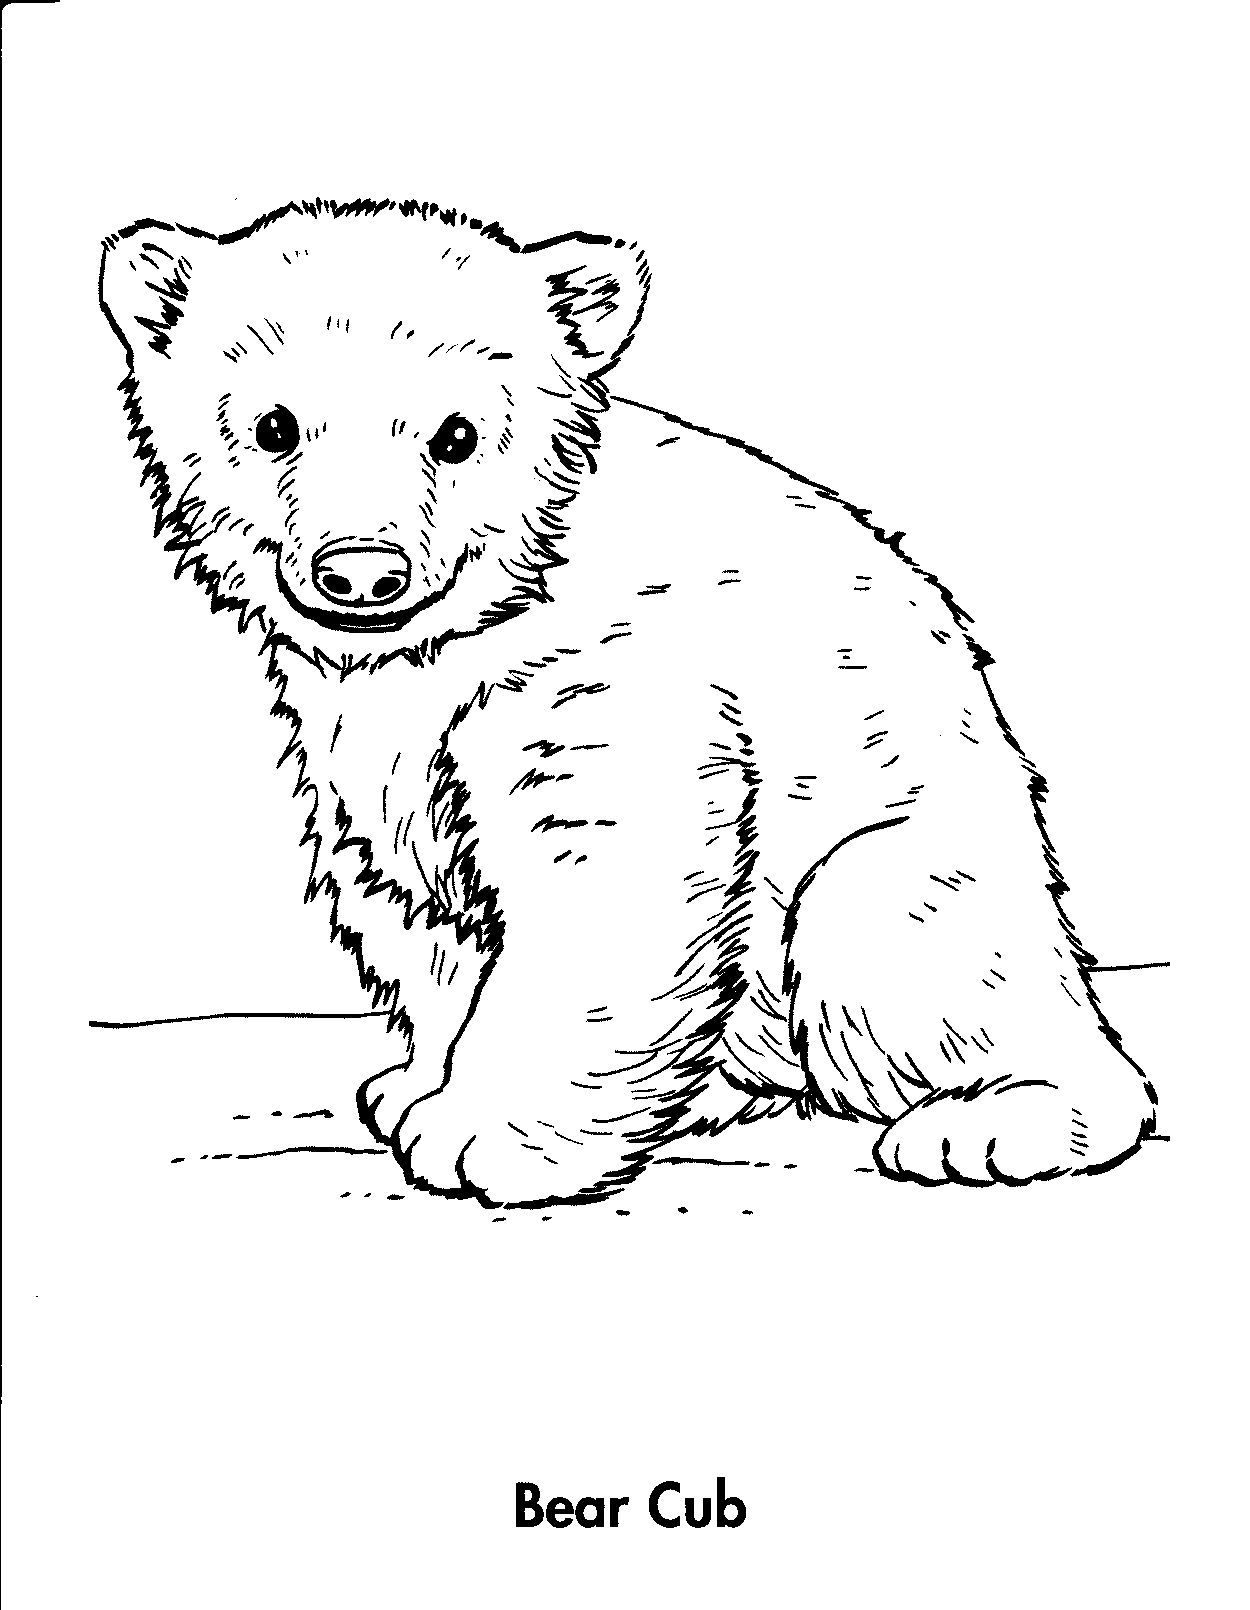 Polar Bear Silhouette Clip Art At Getdrawings